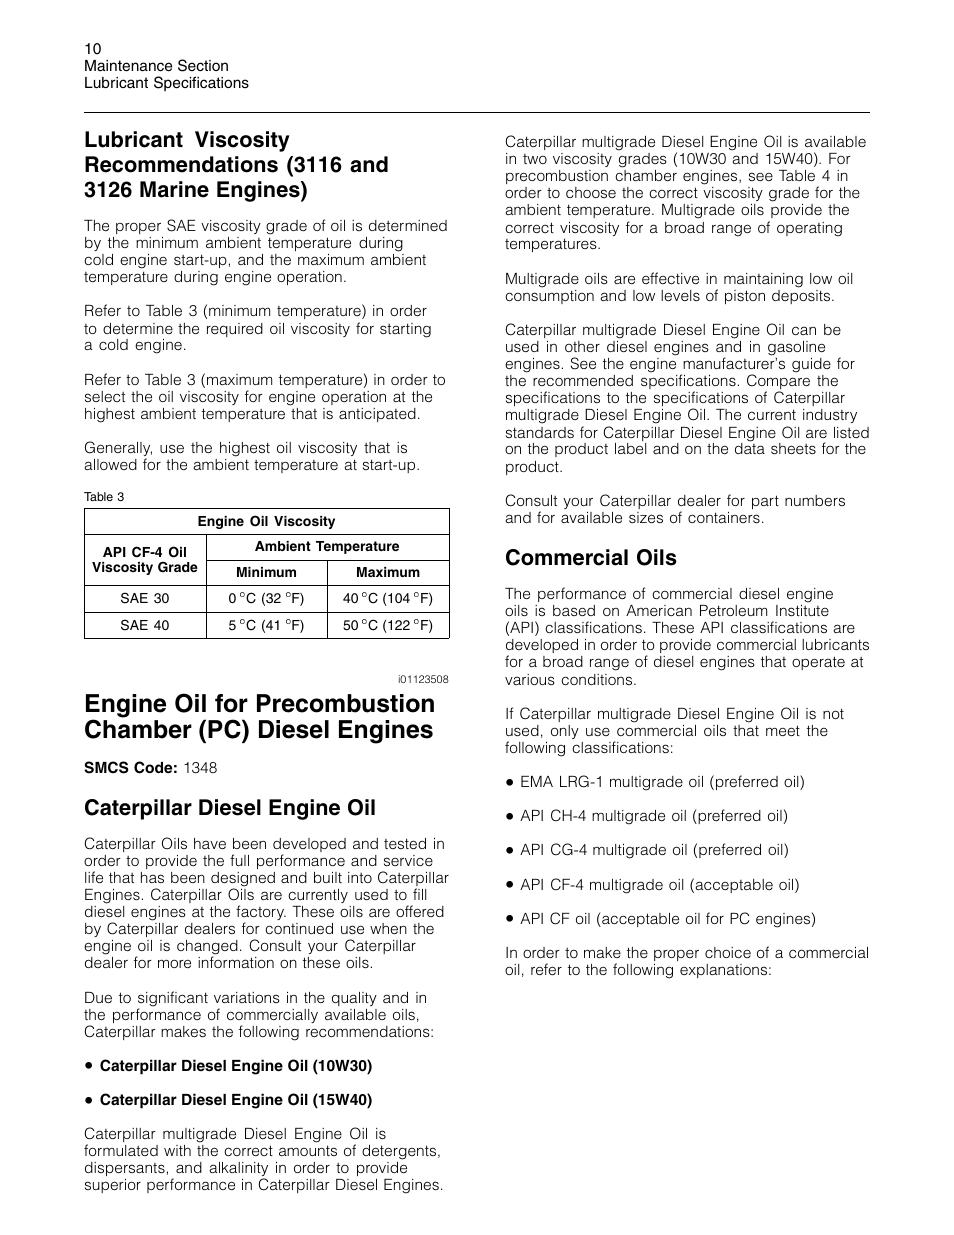 Caterpillar diesel engine oil, Commercial oils | 3Com Caterpillar  Commercial Diesel Engine SEBU6251-06